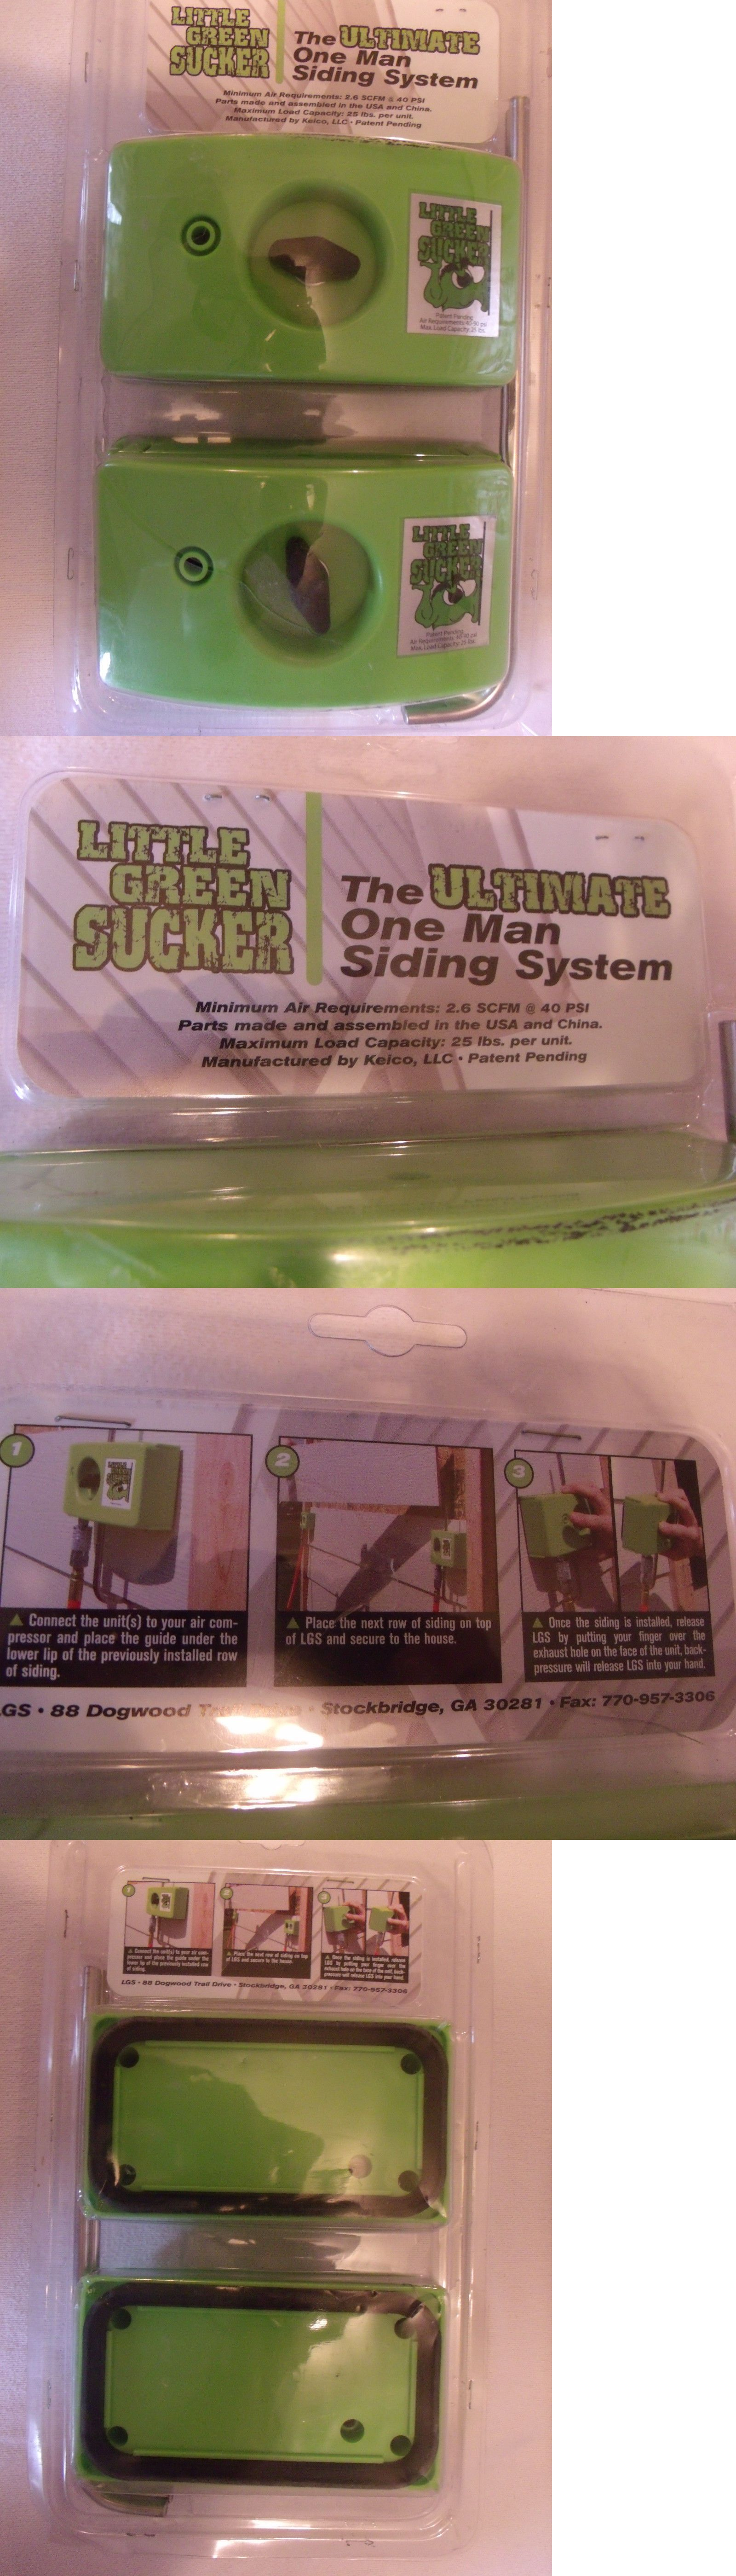 Little Green Sucker Hardie Siding And Trim Gauges New One Man Siding System Hardie Siding Fiber Cement Siding Installation Siding